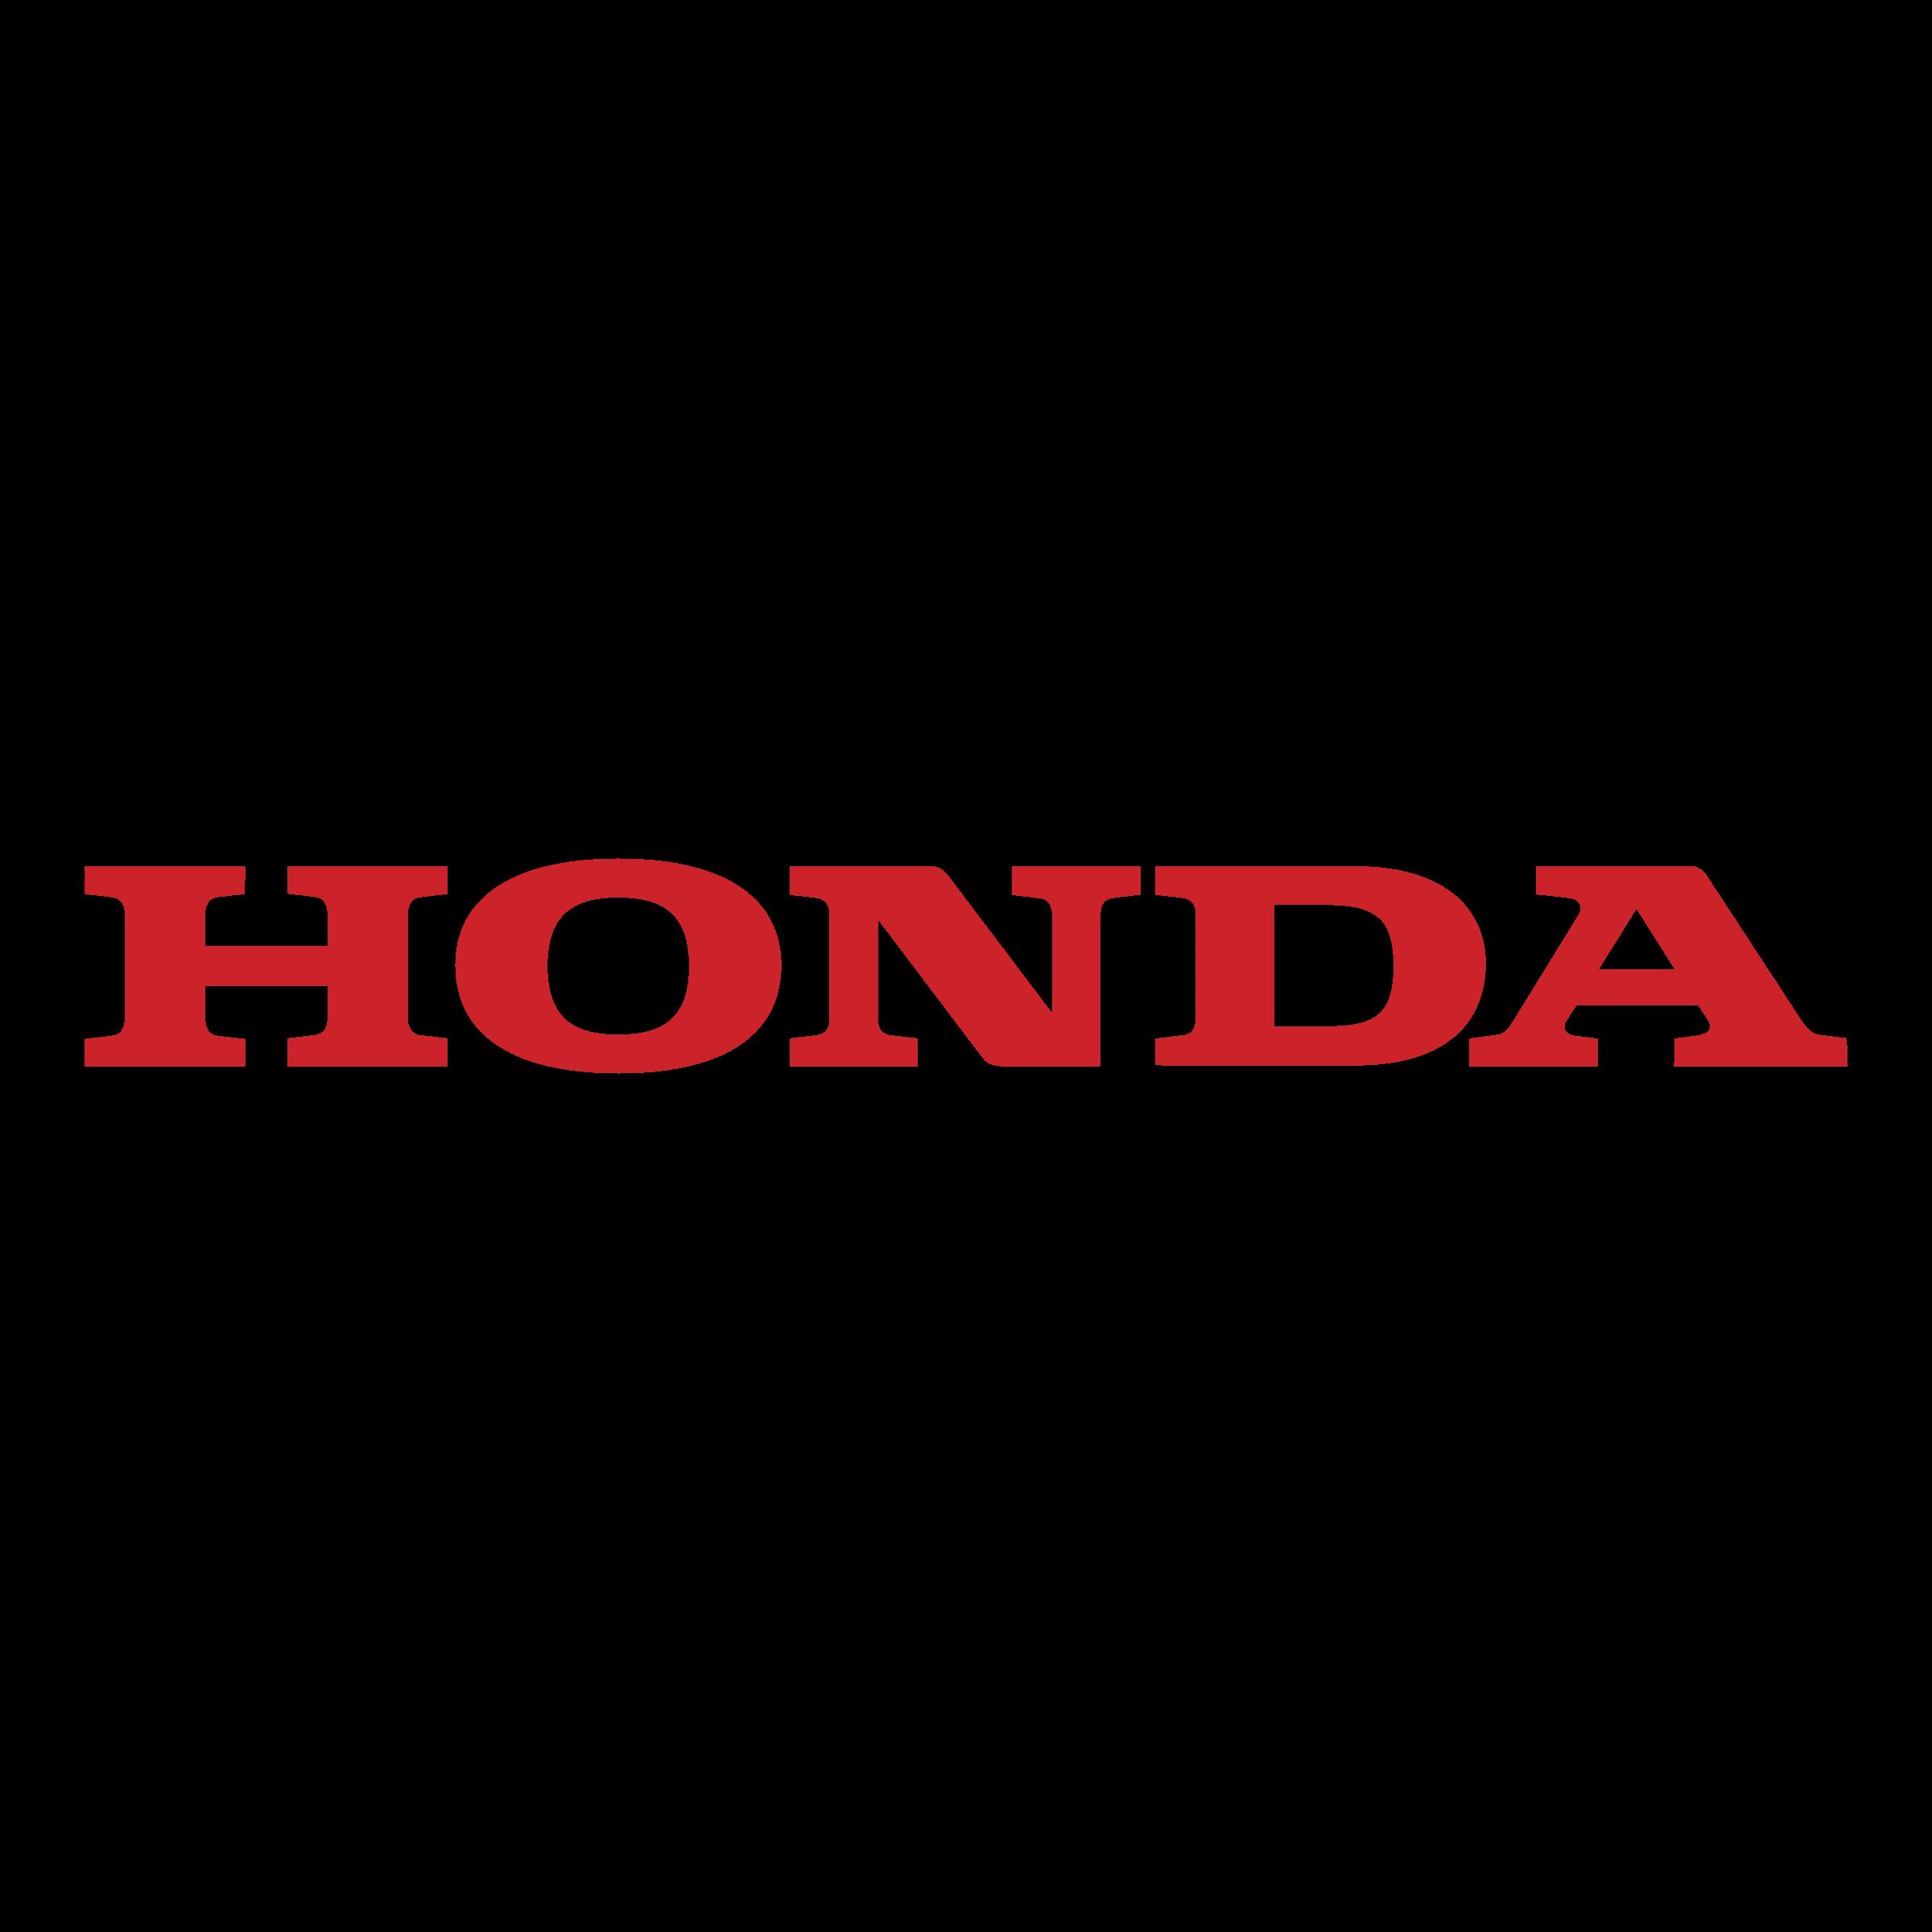 honda logo png transparent svg vector freebie supply rh freebiesupply com logo honda vector logo honda beat 2017 merah